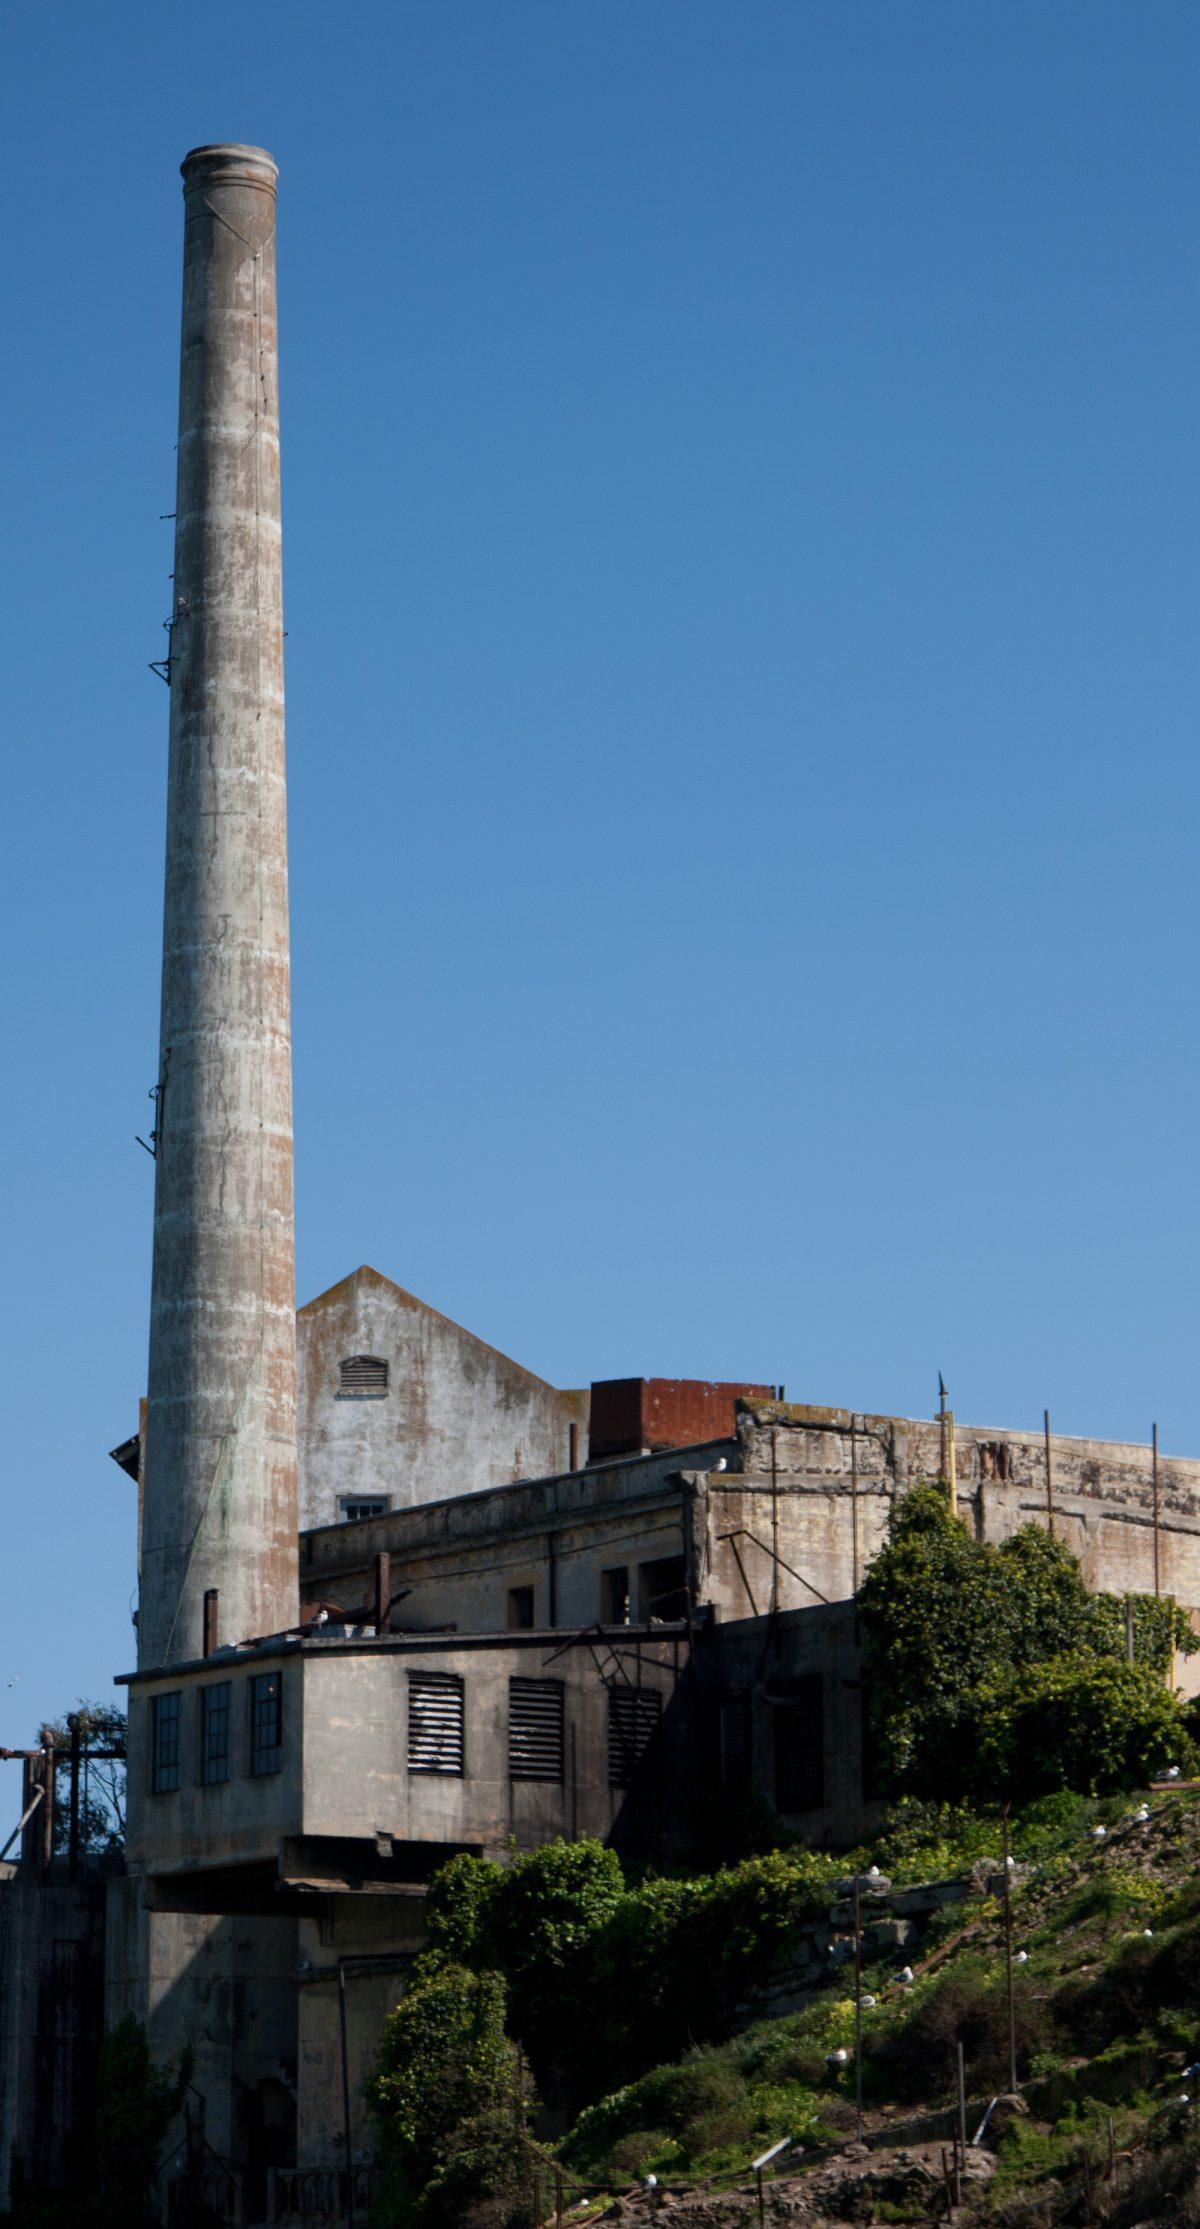 Power plant - of Alcatraz, prison, alcatraz